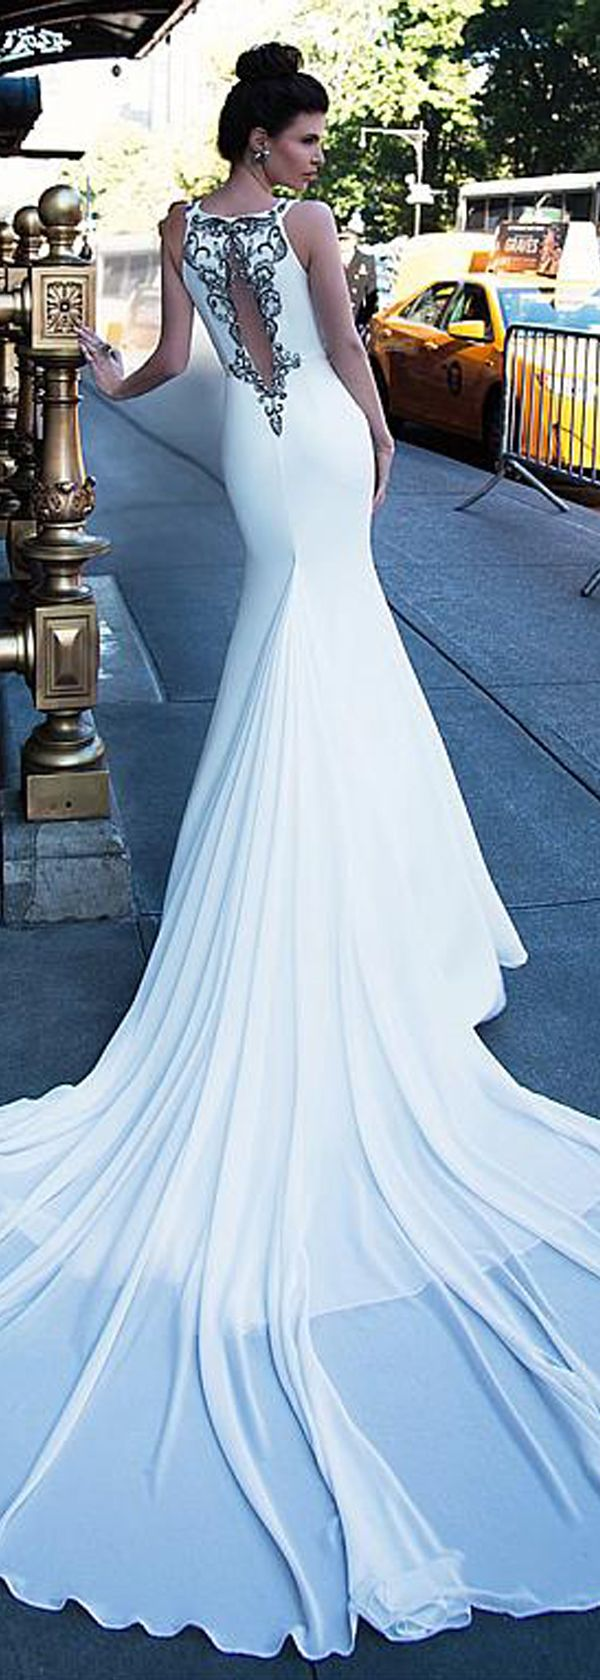 Grey mermaid wedding dress  Fascinating Chiffon Jewel Neckline Mermaid Wedding Dress With